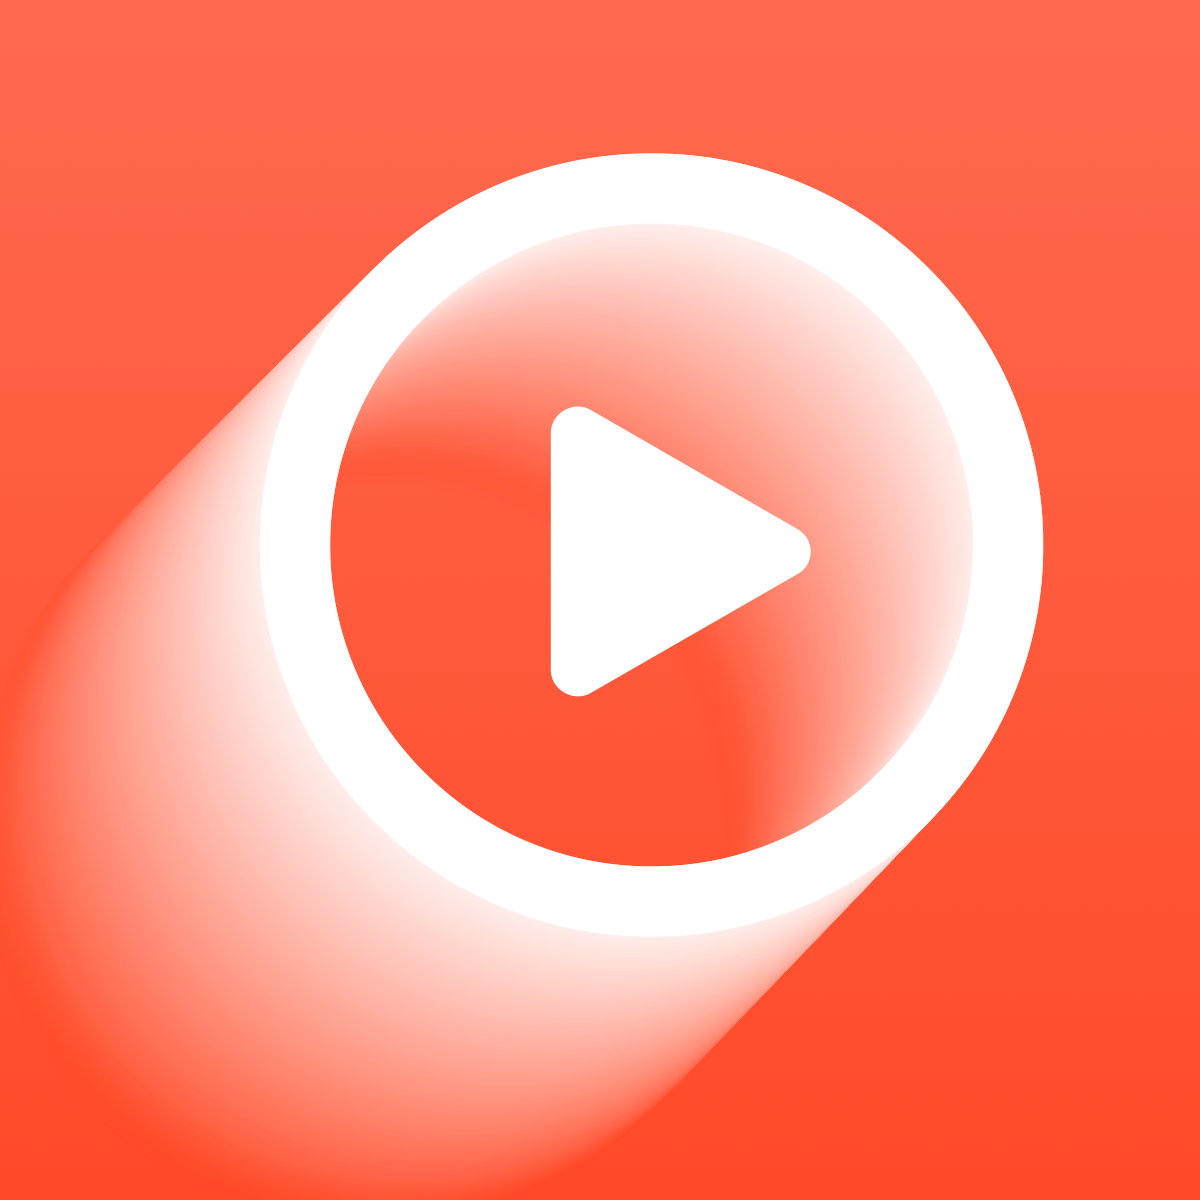 Swish re-designing logo and icon